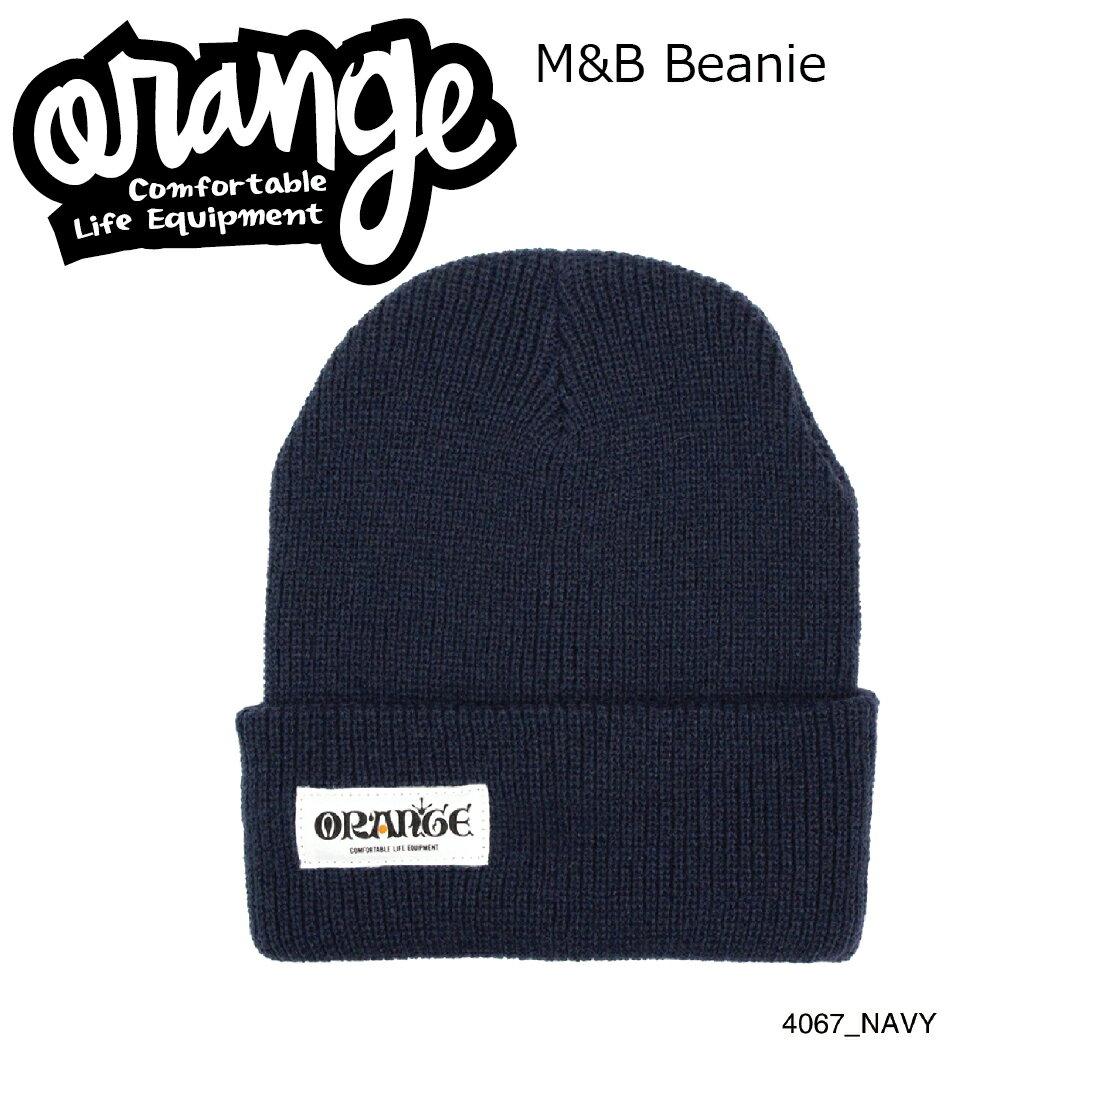 Oran'ge M&B Beanie 4067 NAVY オレンジ エムアンドビー ビーニー ニットキャップ 2つ折り